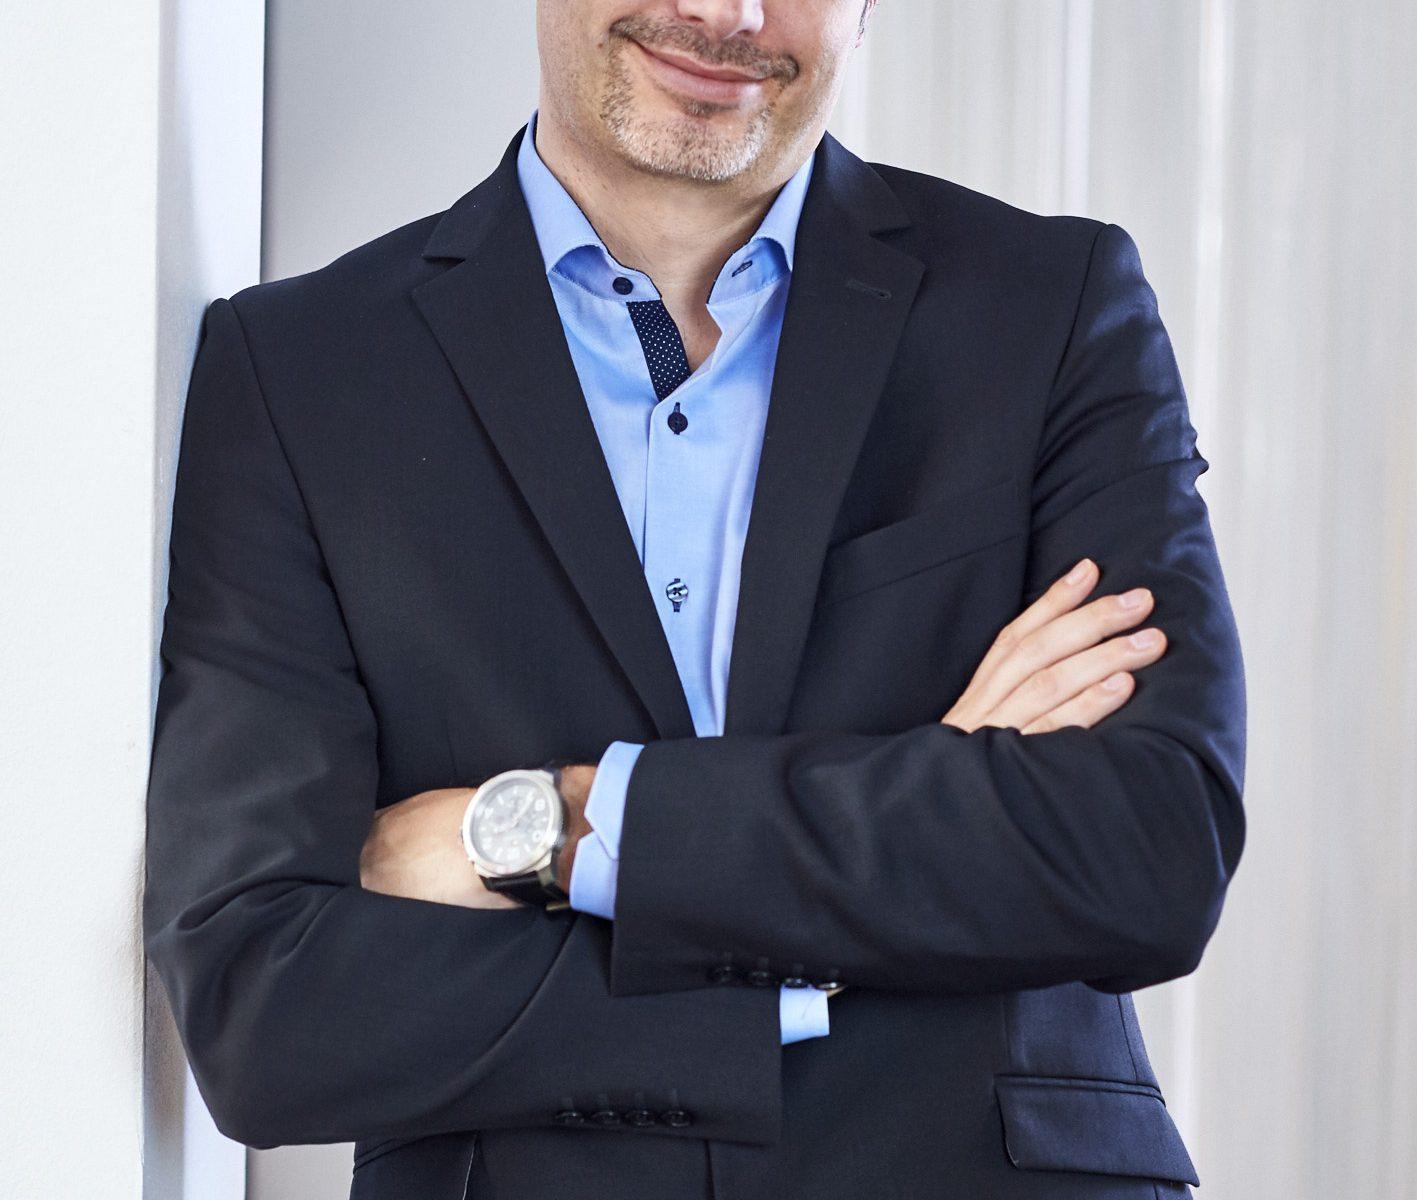 Sven Klimpel, Hermes Germany GmbH